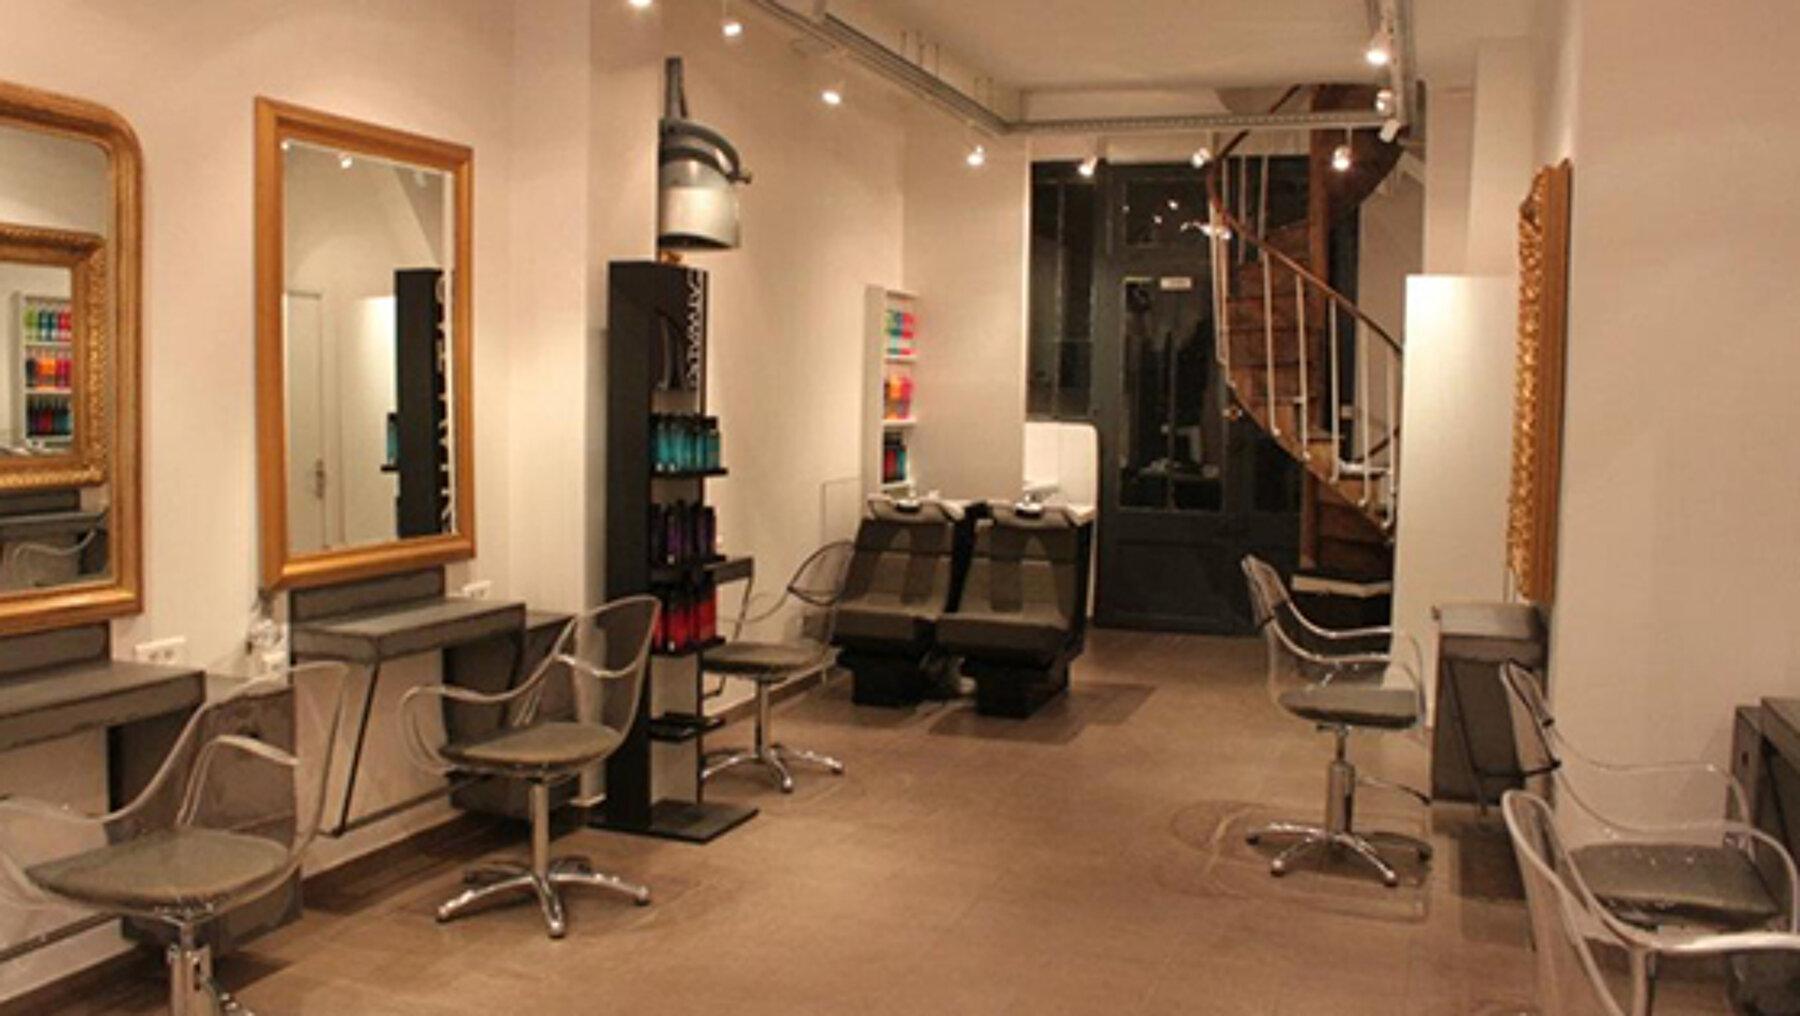 Salon de coiffure - Paris